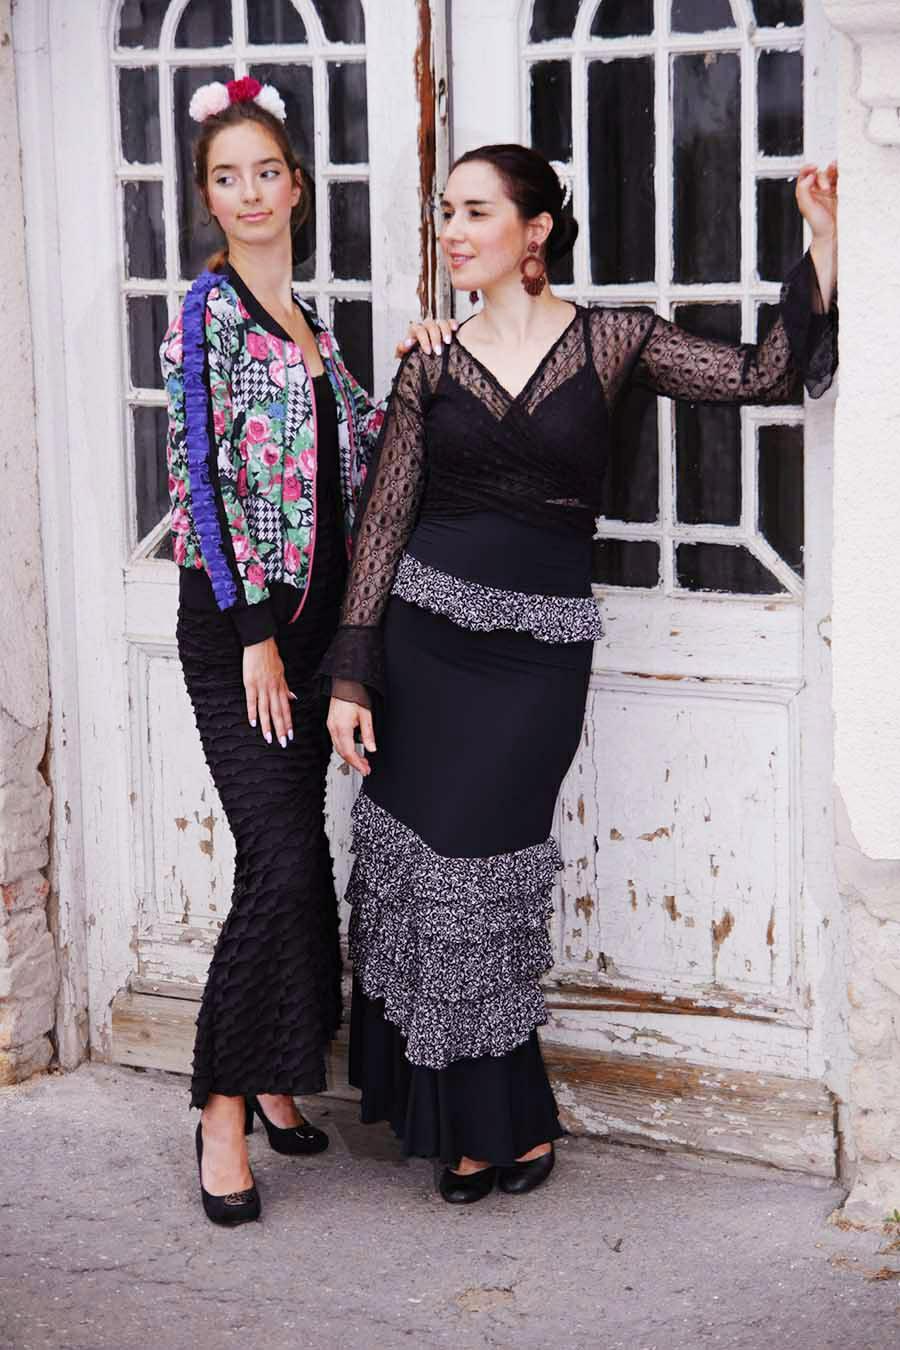 Elasticated flamenco skirt with ruffles and high waist